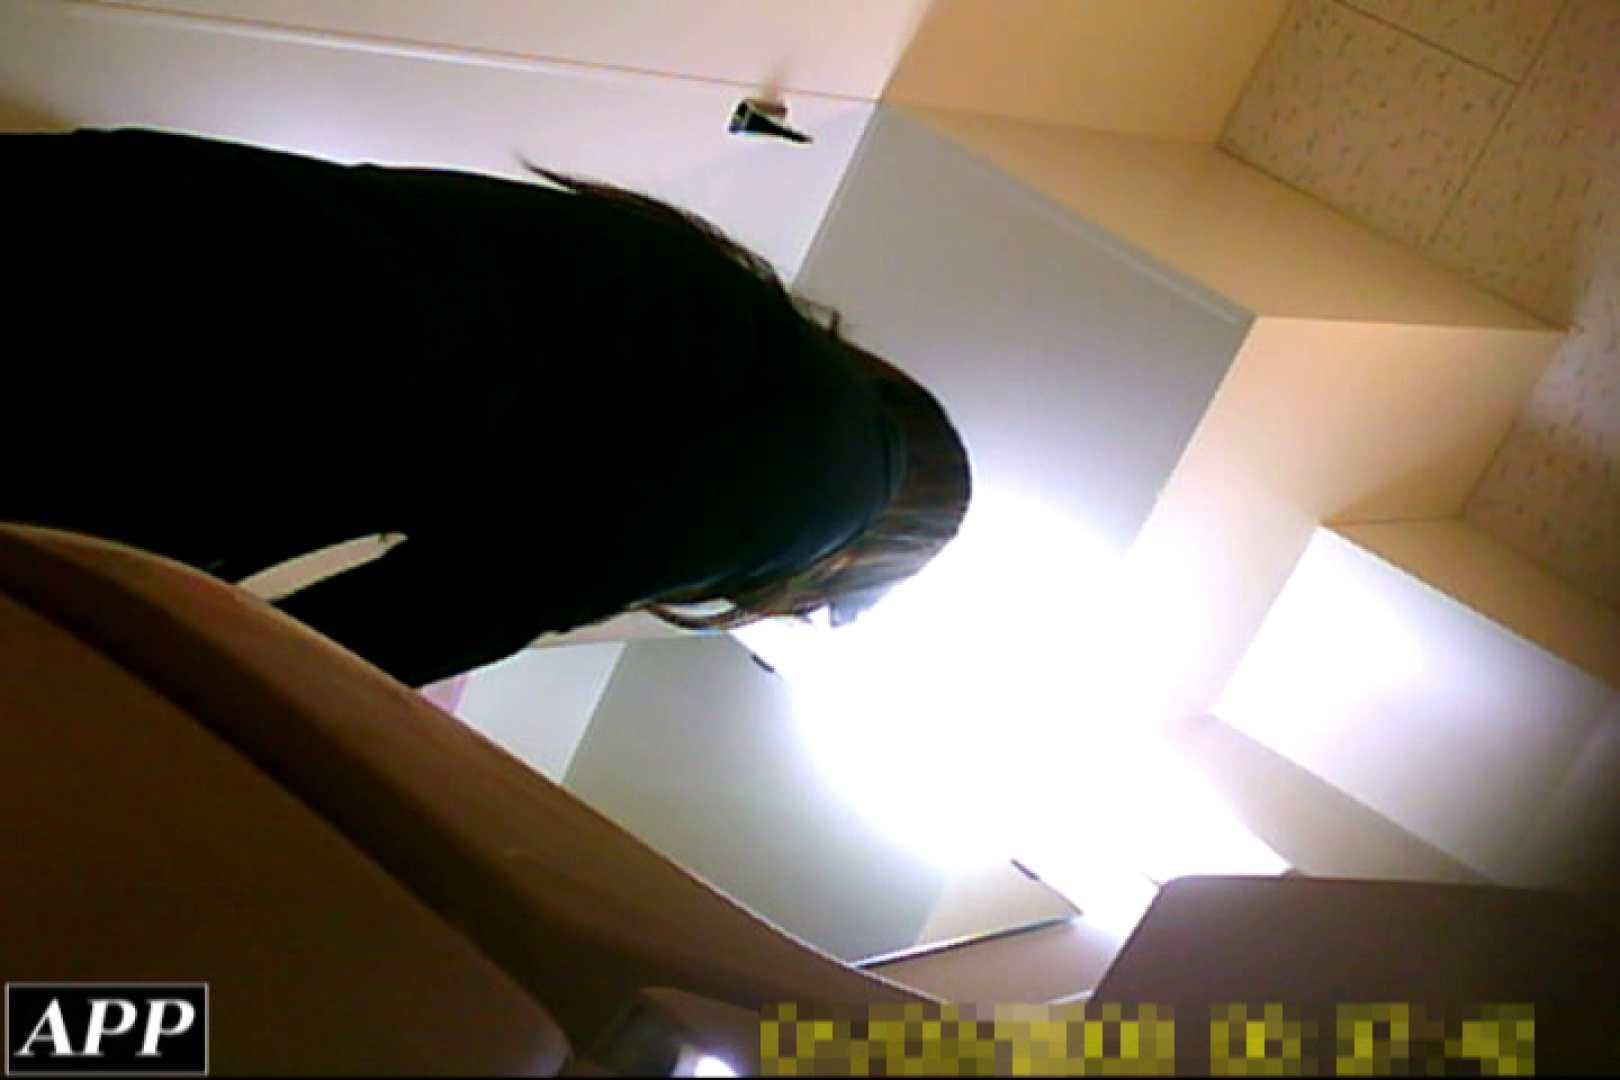 3視点洗面所 vol.121 OLハメ撮り  86Pix 13